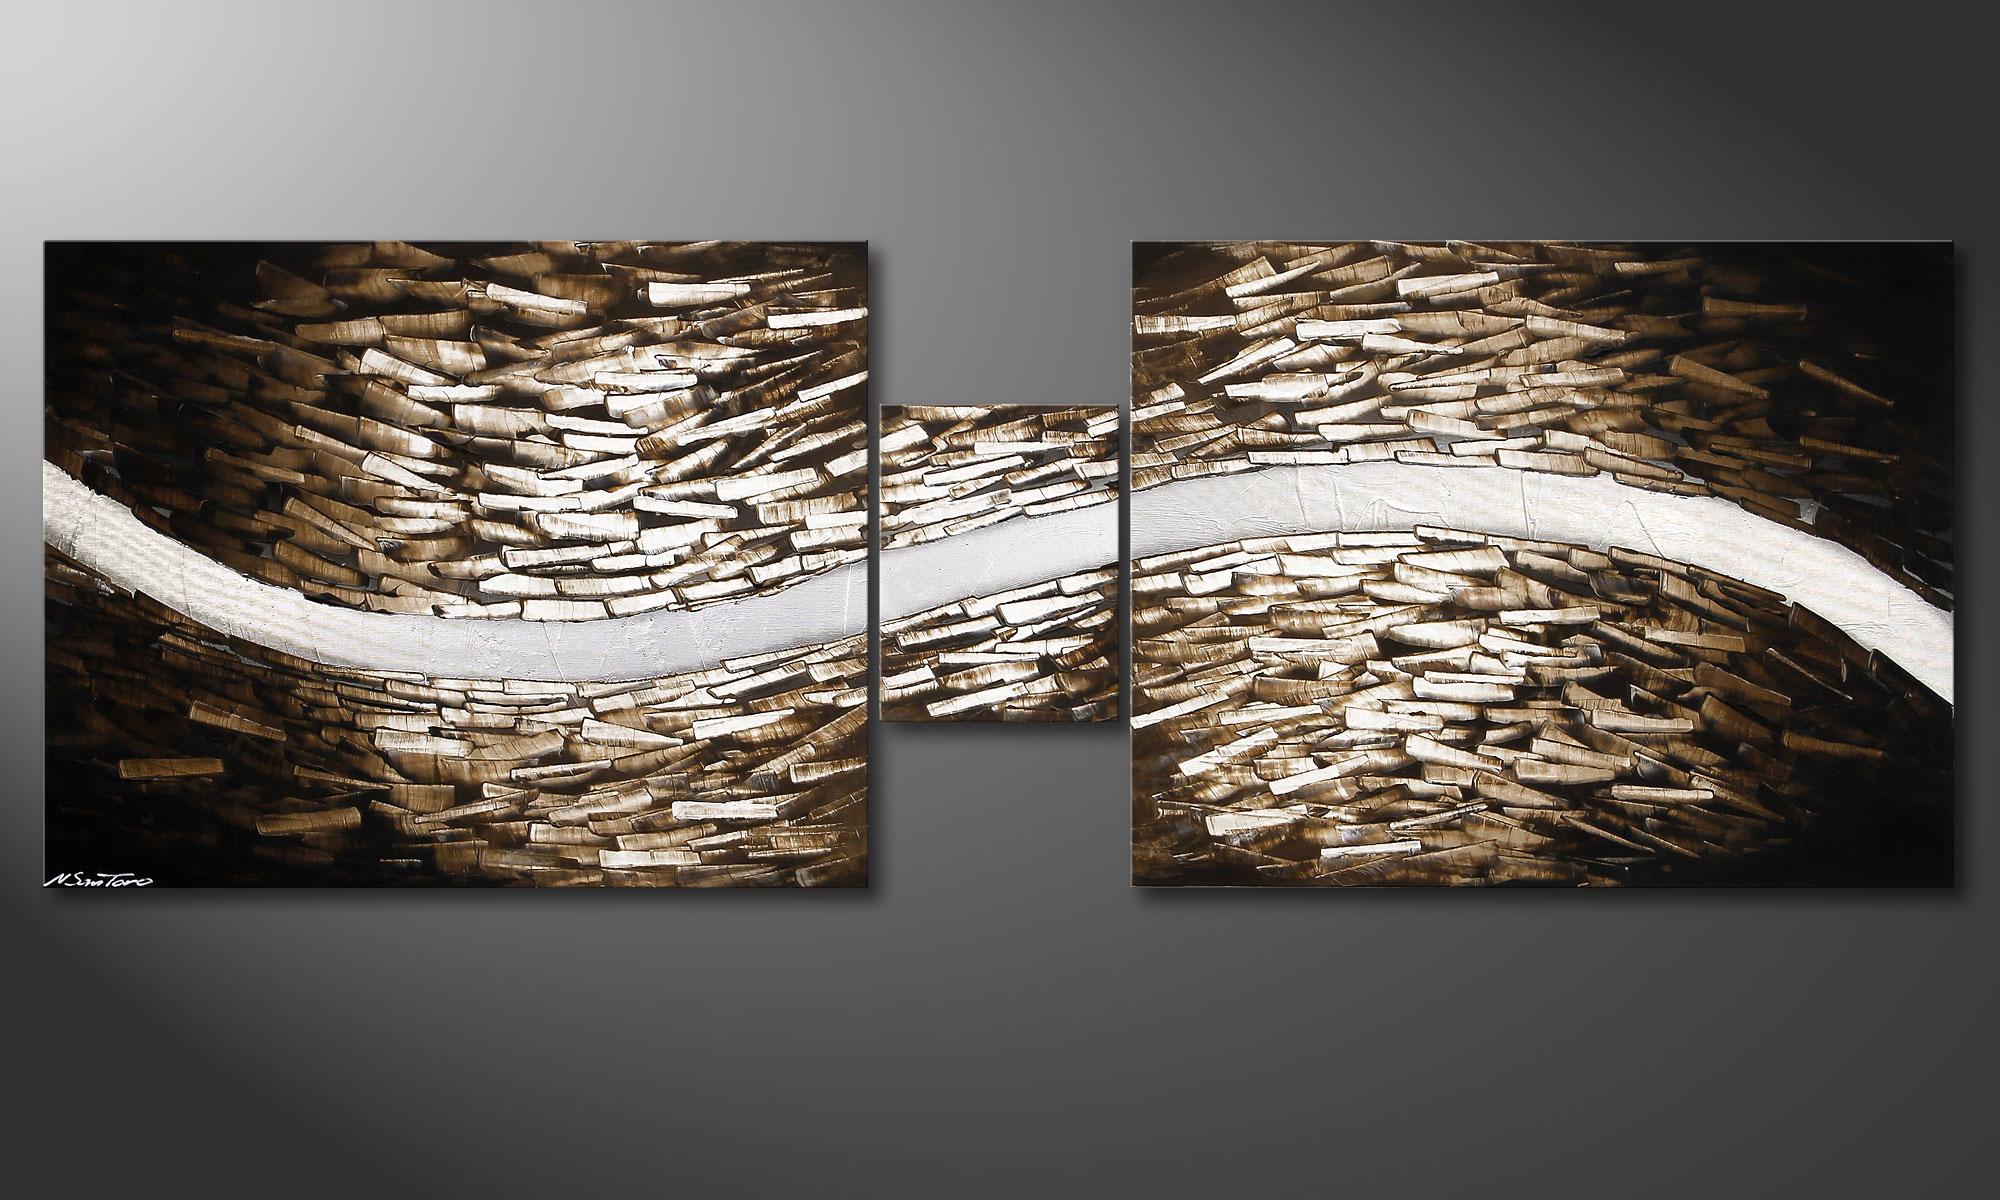 https://www.tableaux-xxl.be/webshop/BILDER_NICK/Woonkamer-schilderij-Clear-River-230x80cm--c027-230x80-XXL_bild_big.jpg